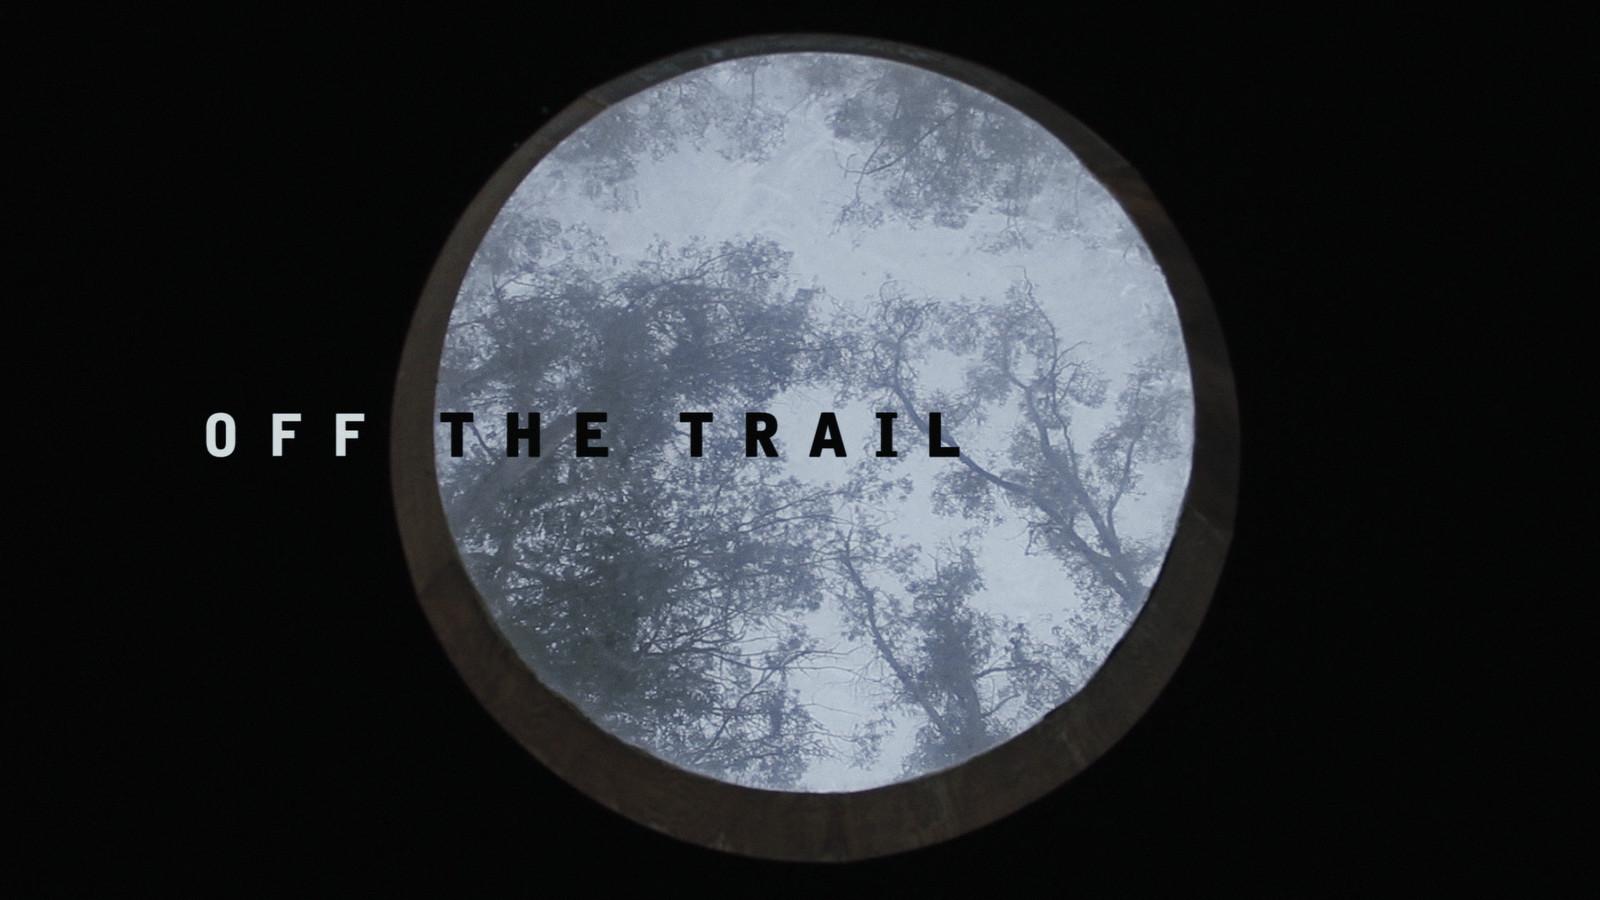 OfftheTrail-01.jpg